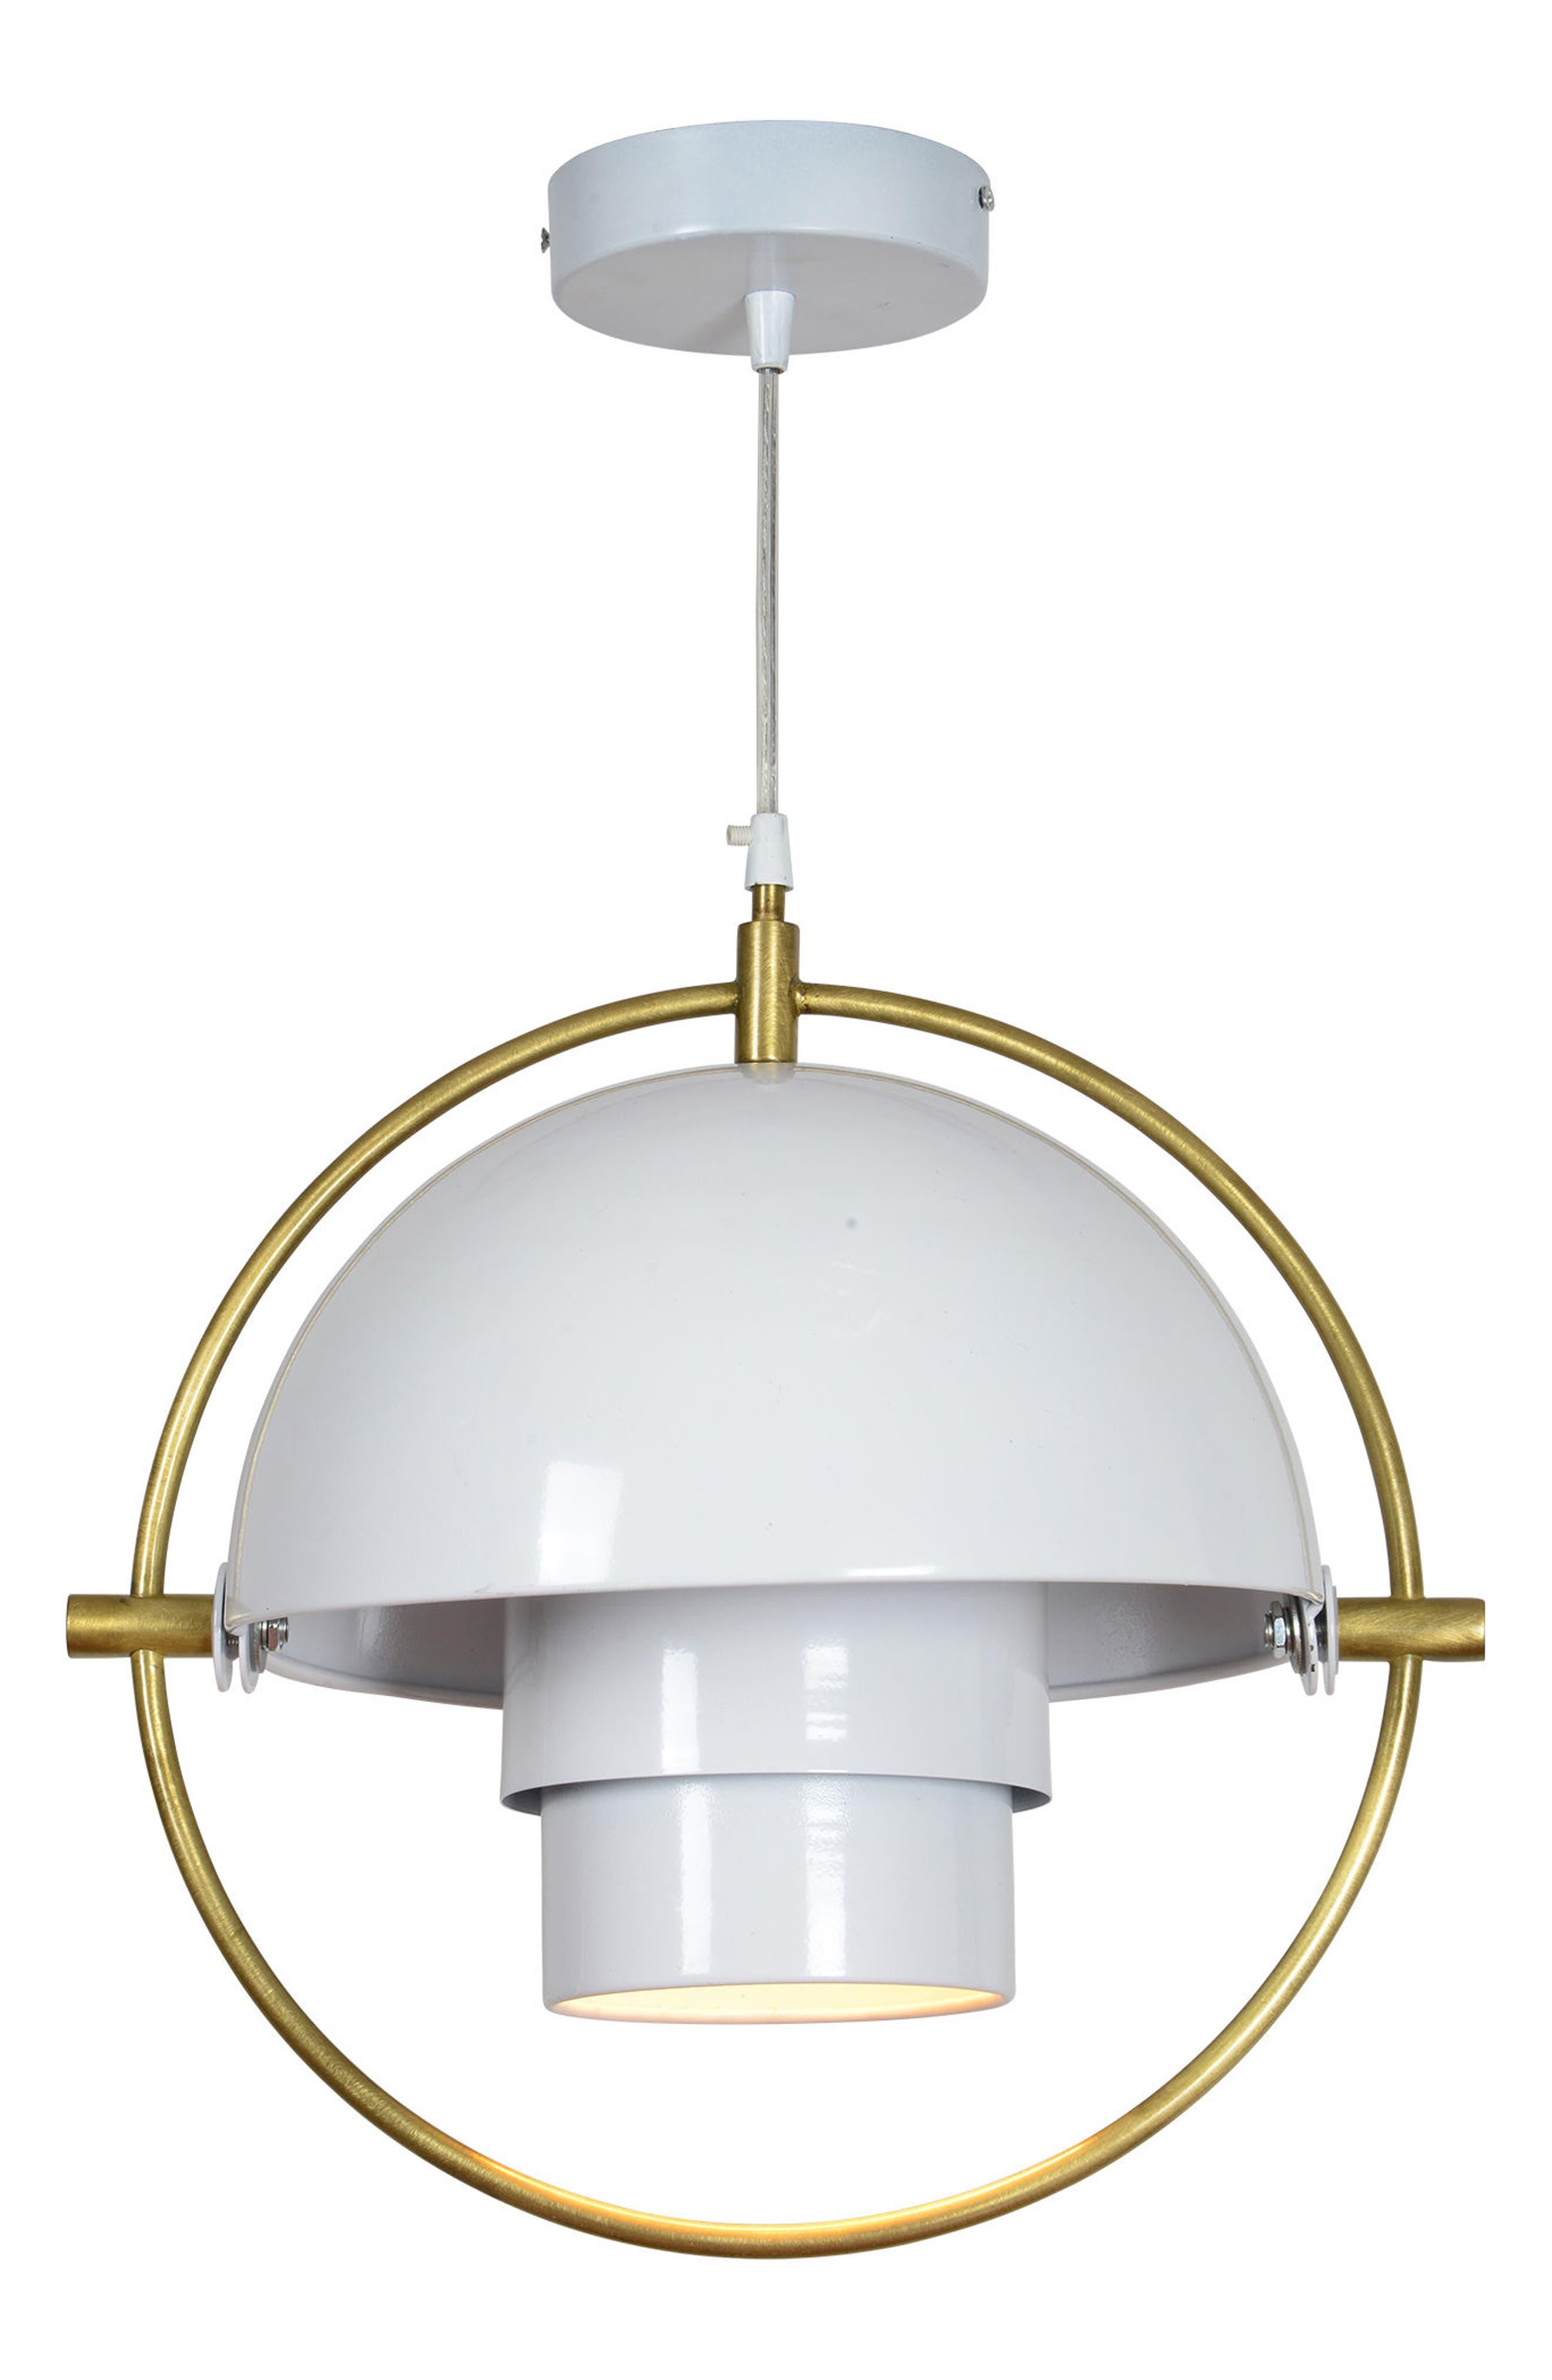 Alternate Image 1 Selected - Renwil Lantern Ceiling Light Fixture